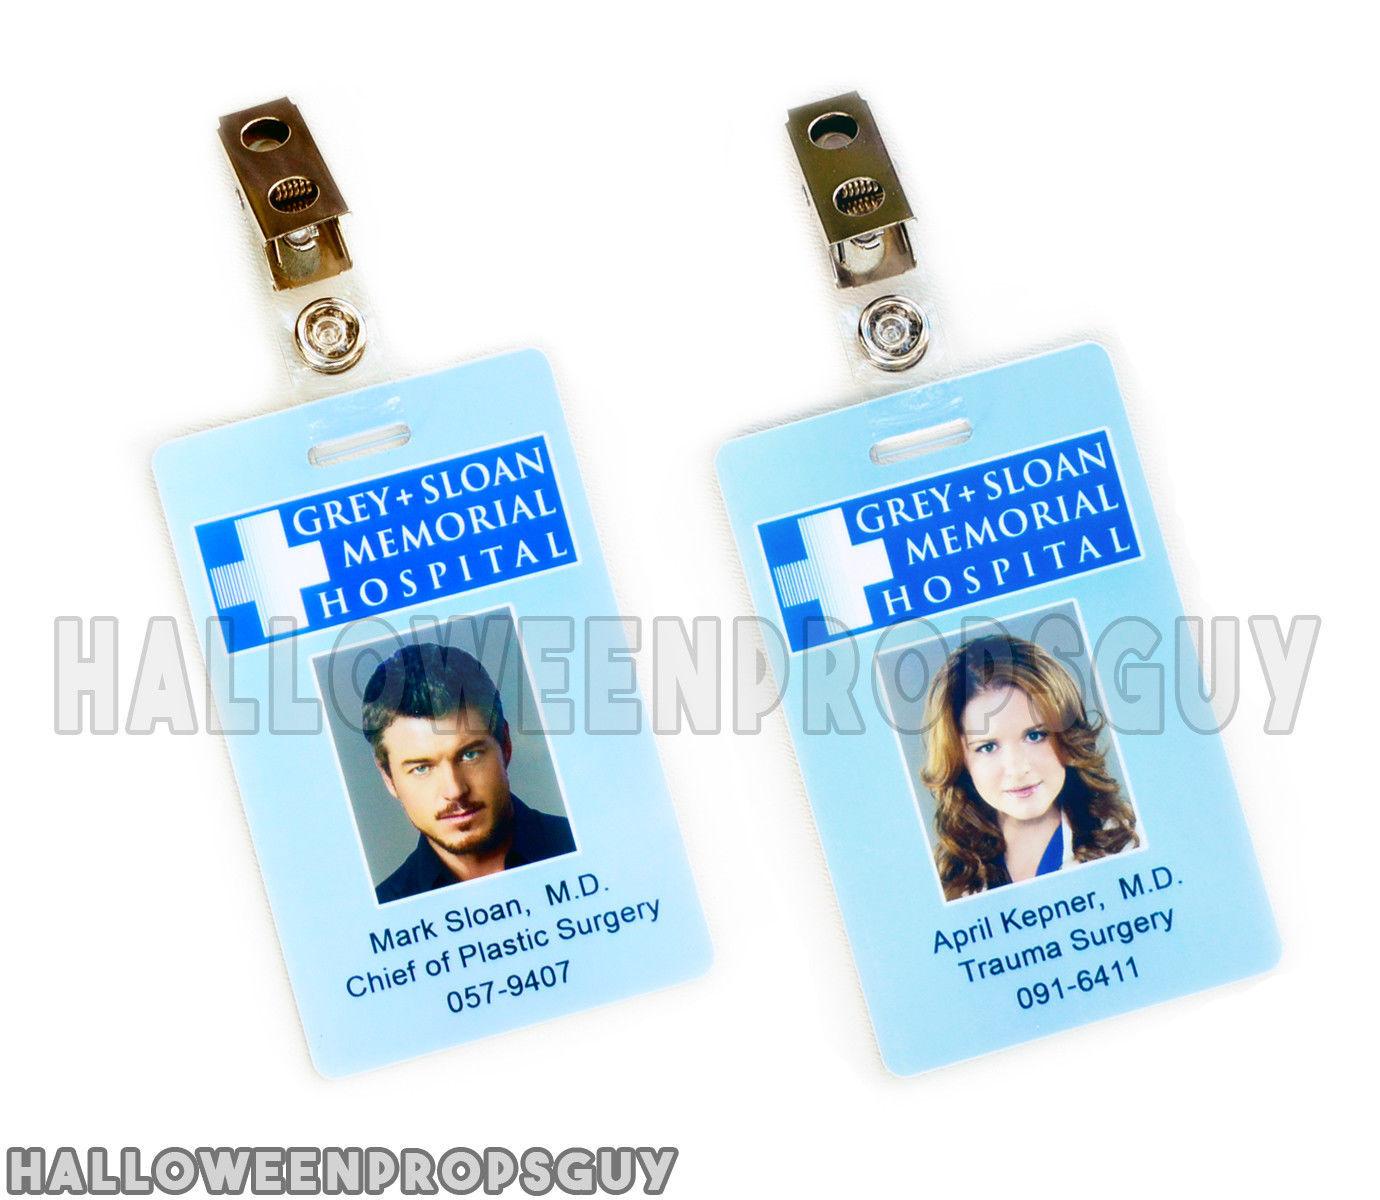 Grey\'s Anatomy Grey + Sloan Meredith Grey ID and 50 similar items